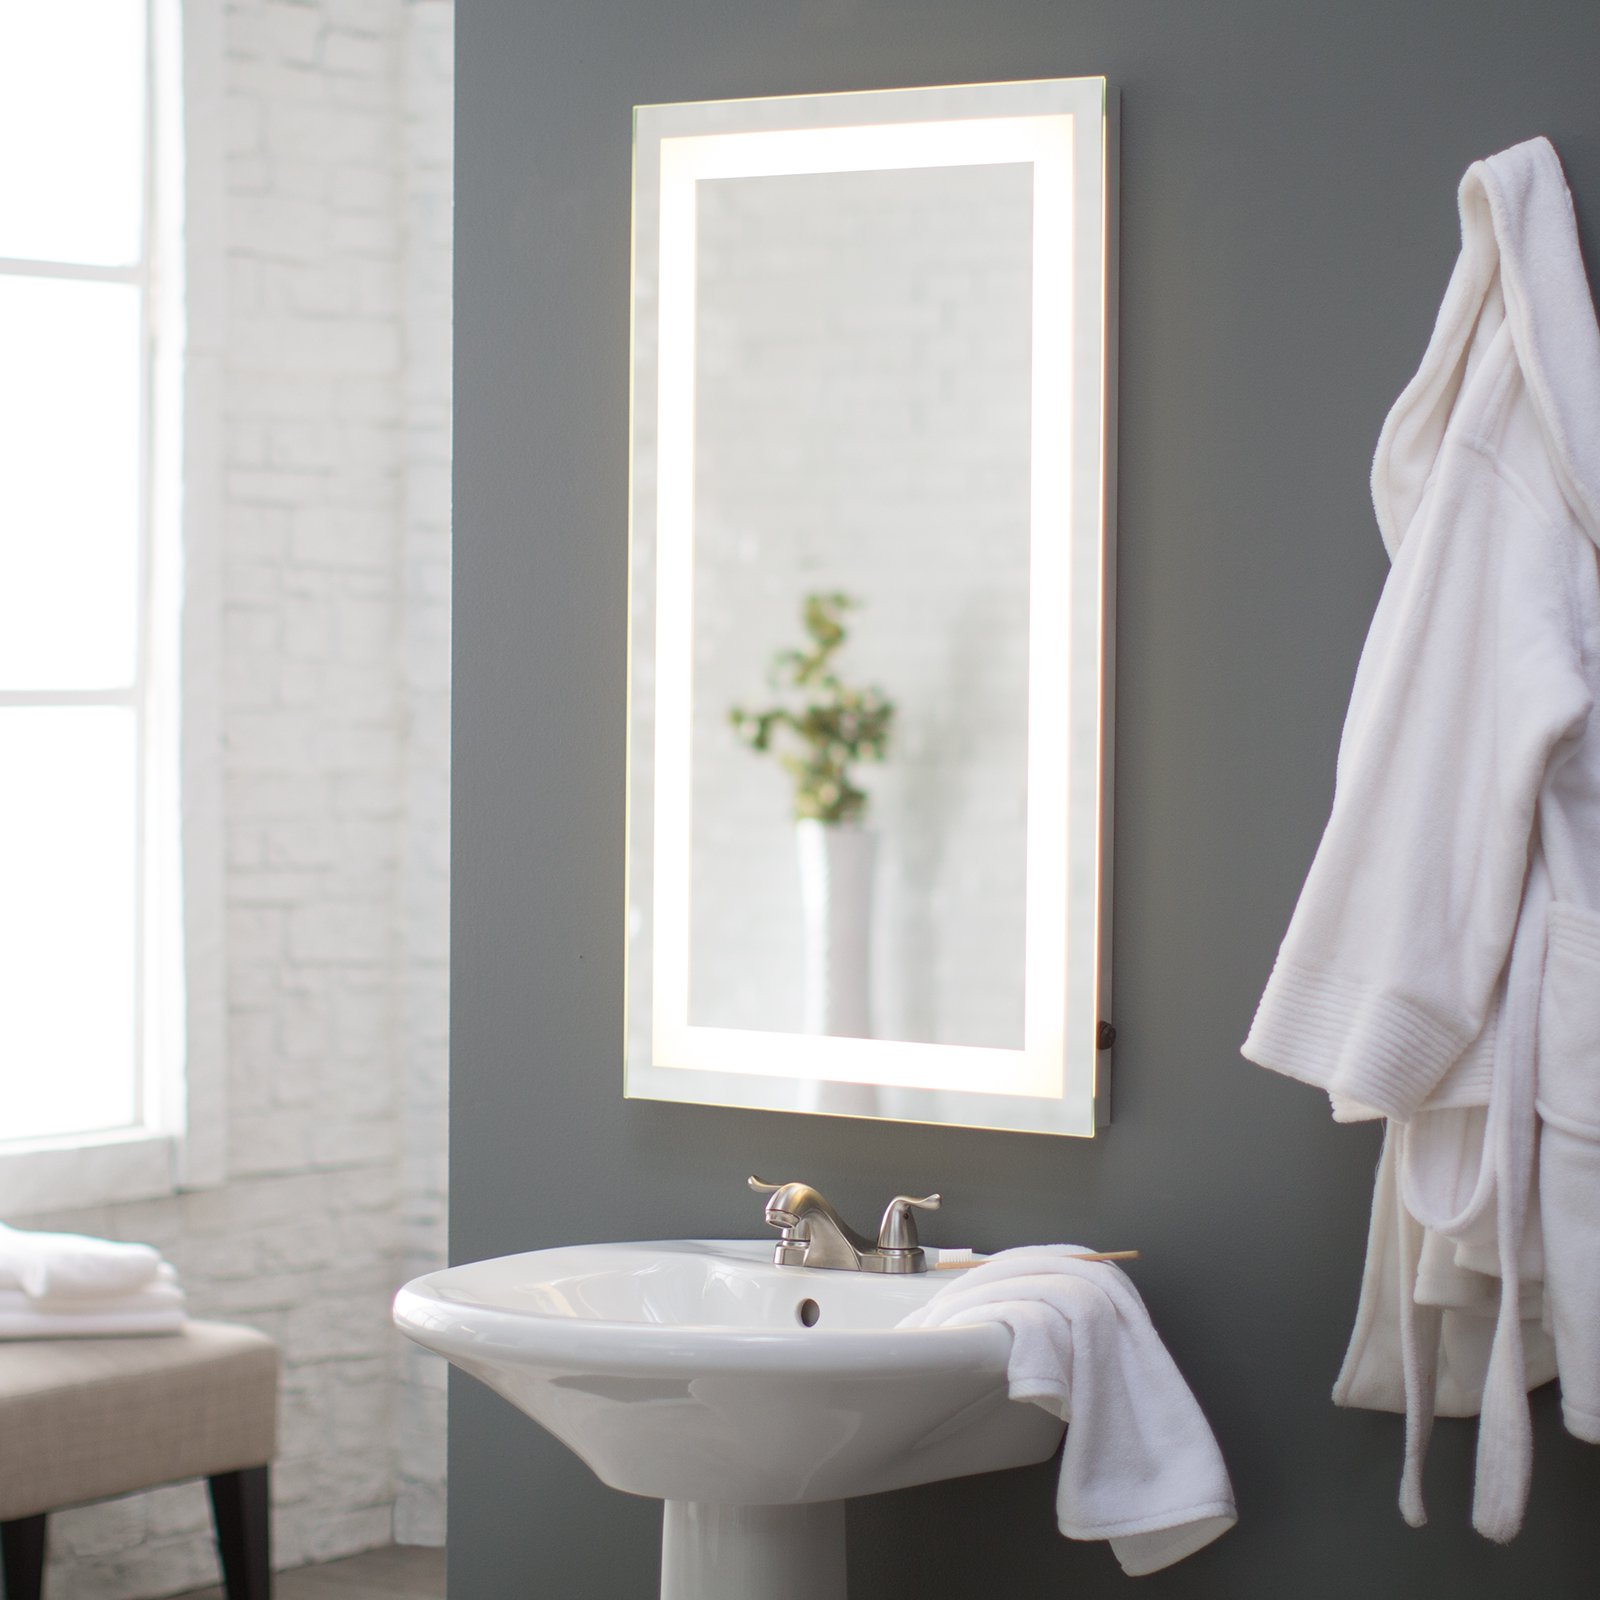 Bathroom mirror with backlight - Bathroom Mirror With Backlight 44